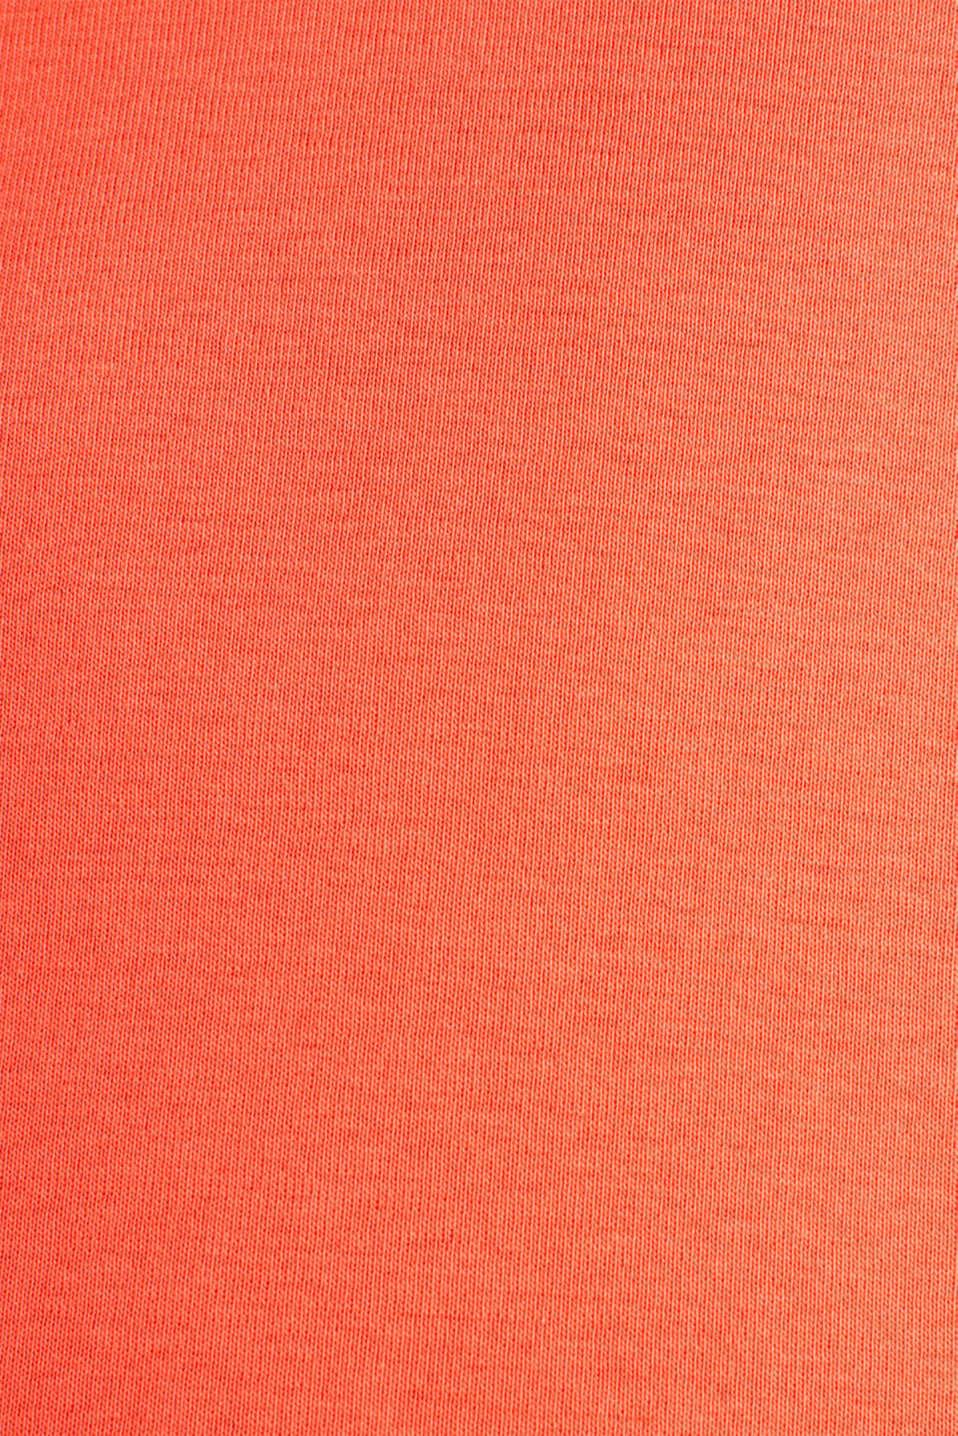 Basic T-shirt in 100% organic cotton, CORAL 4, detail image number 4